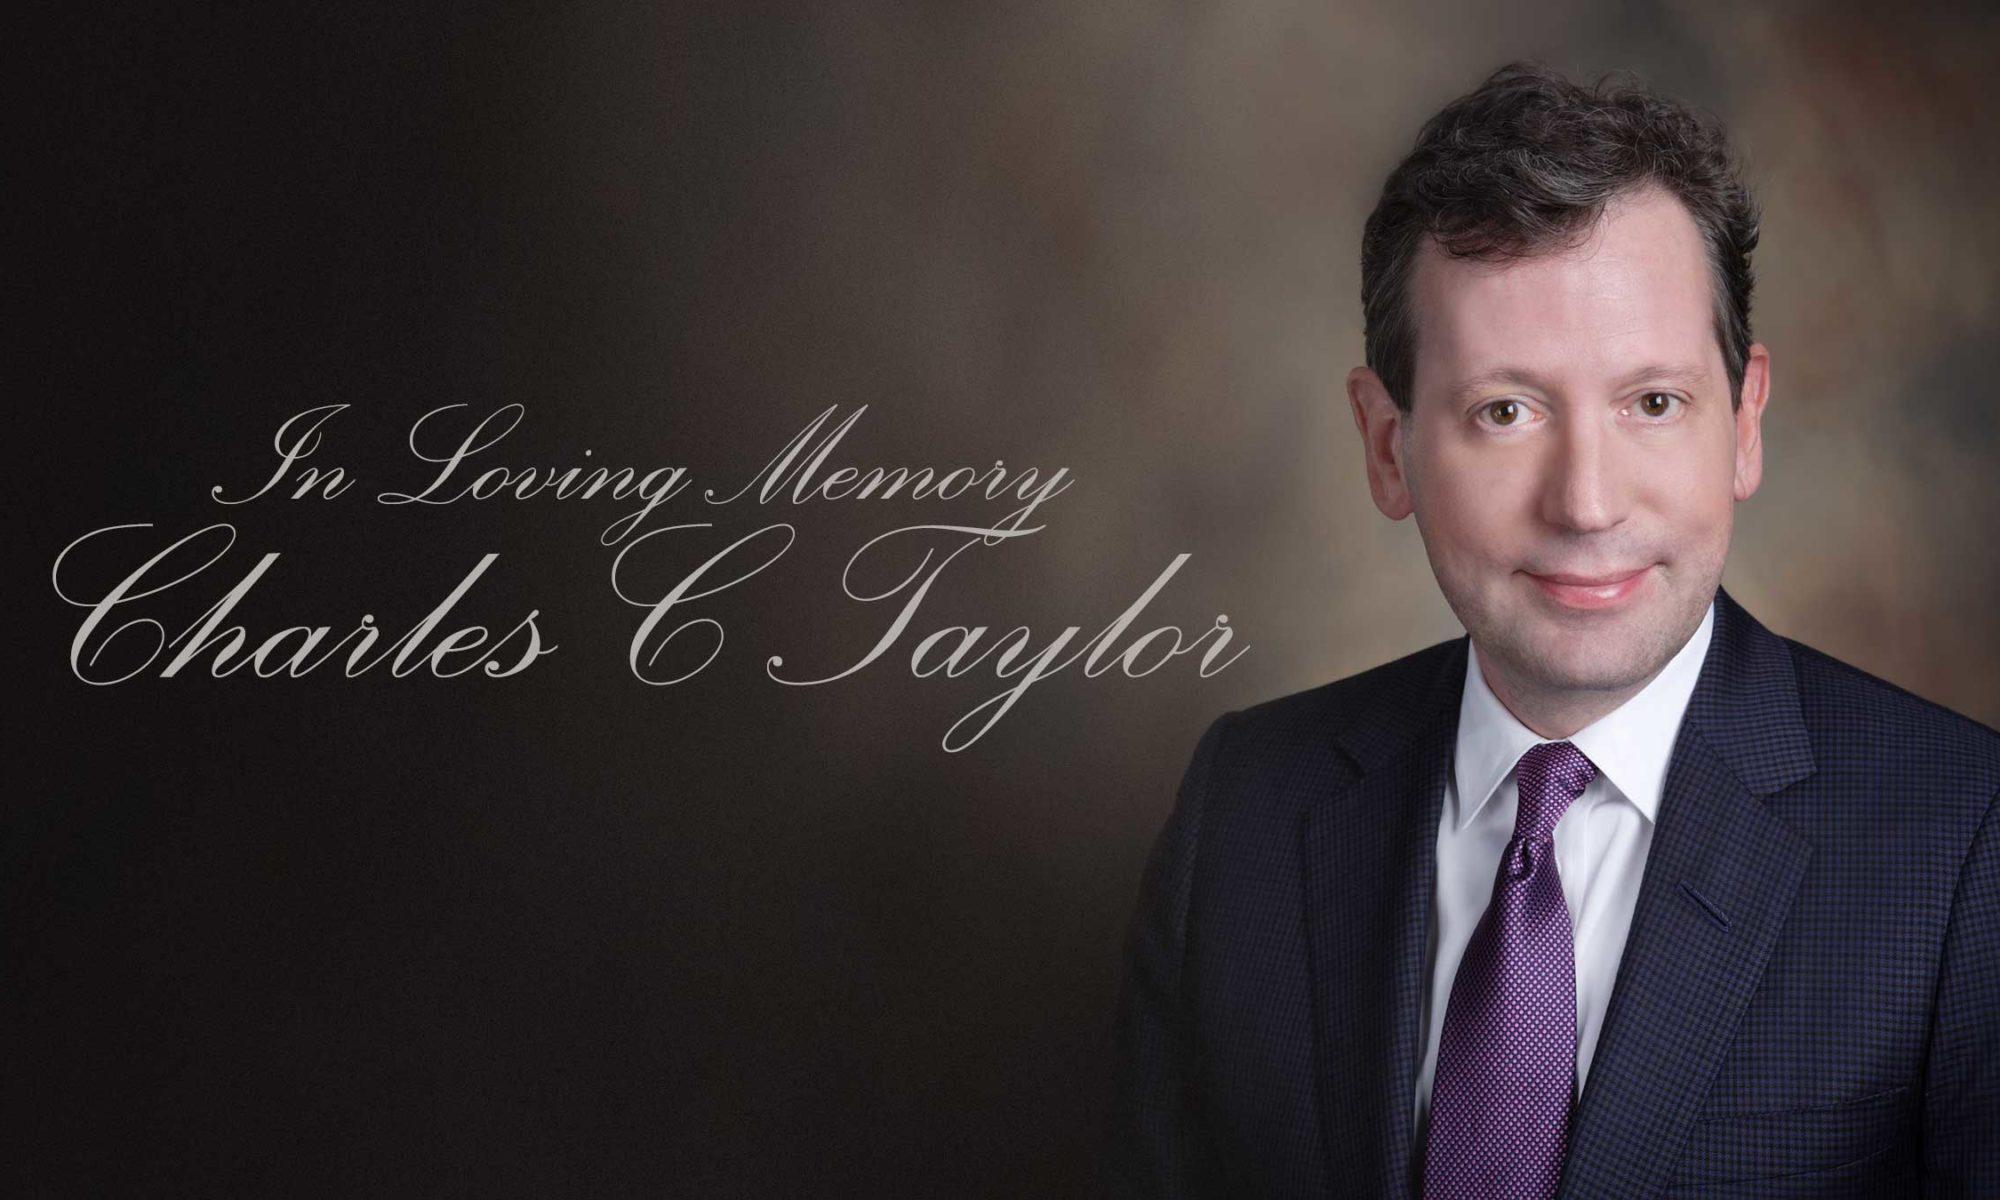 In loving memory of Charles C Taylor